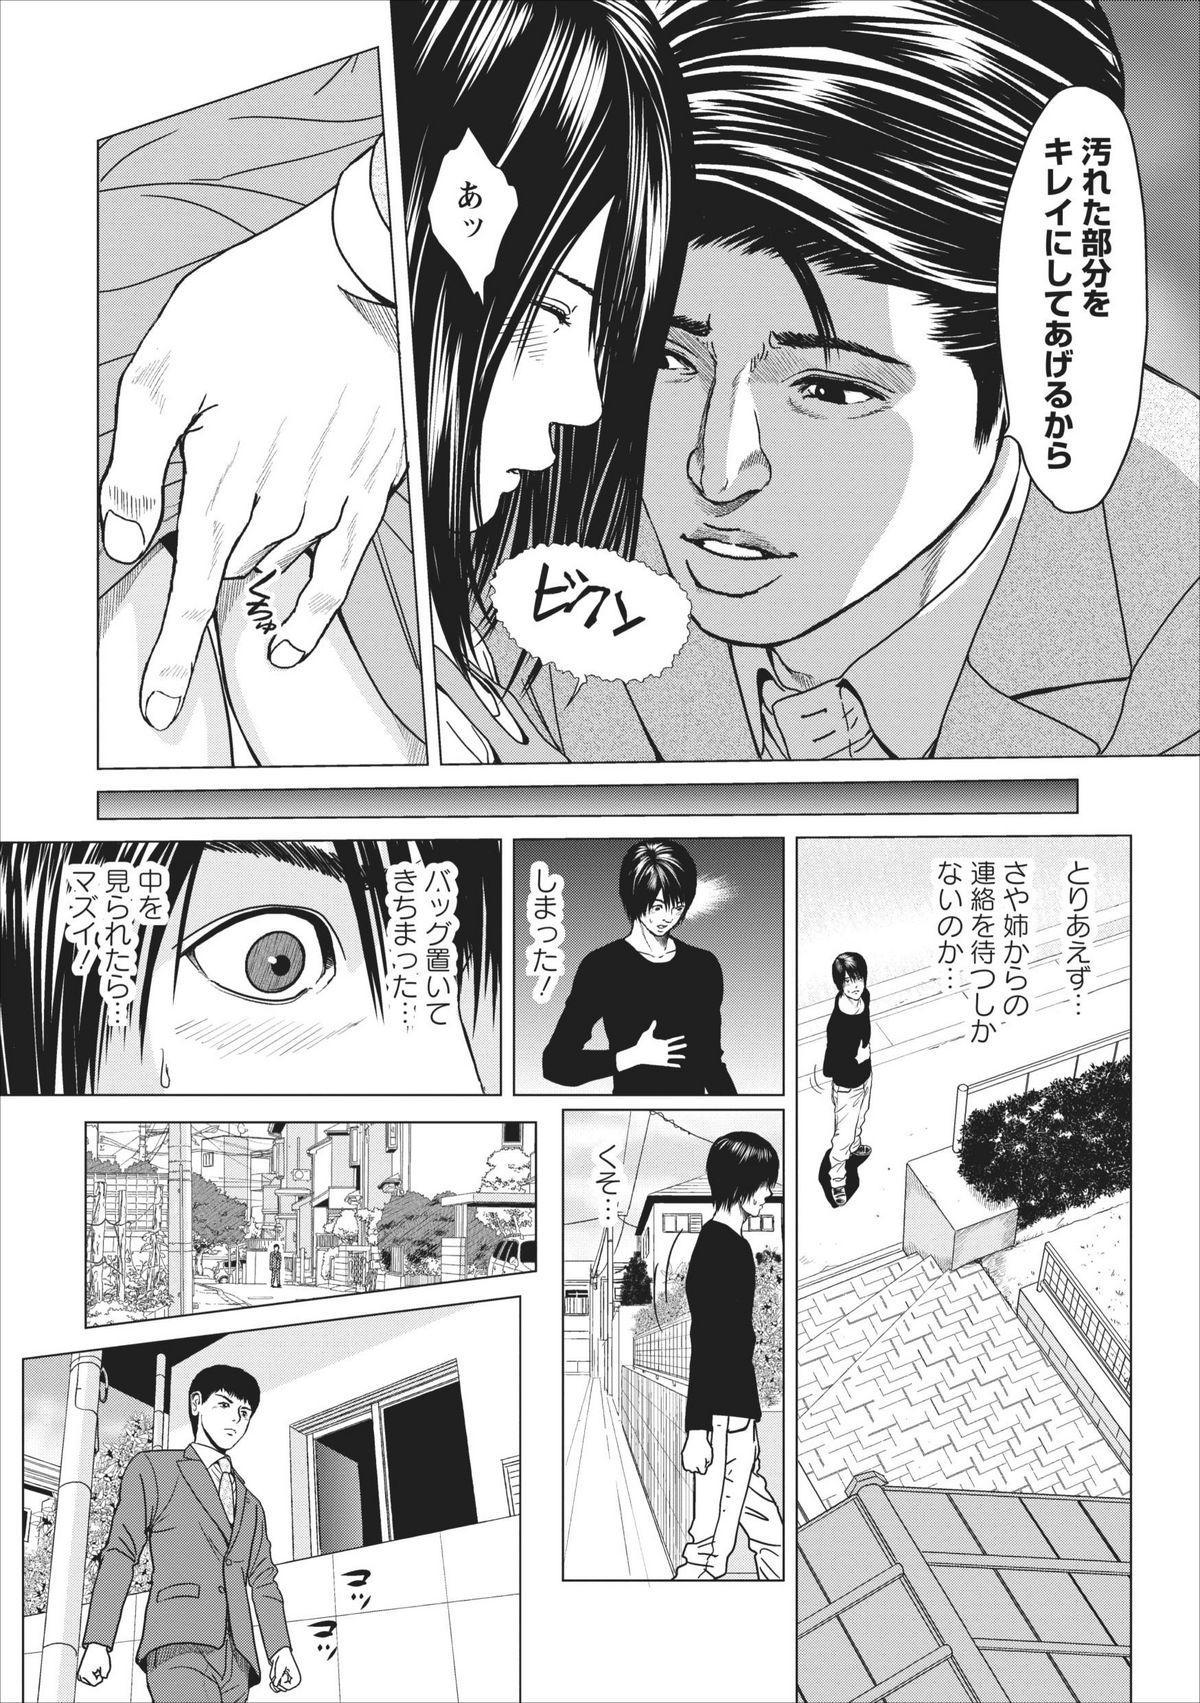 Sex Izonshou ch.9 15